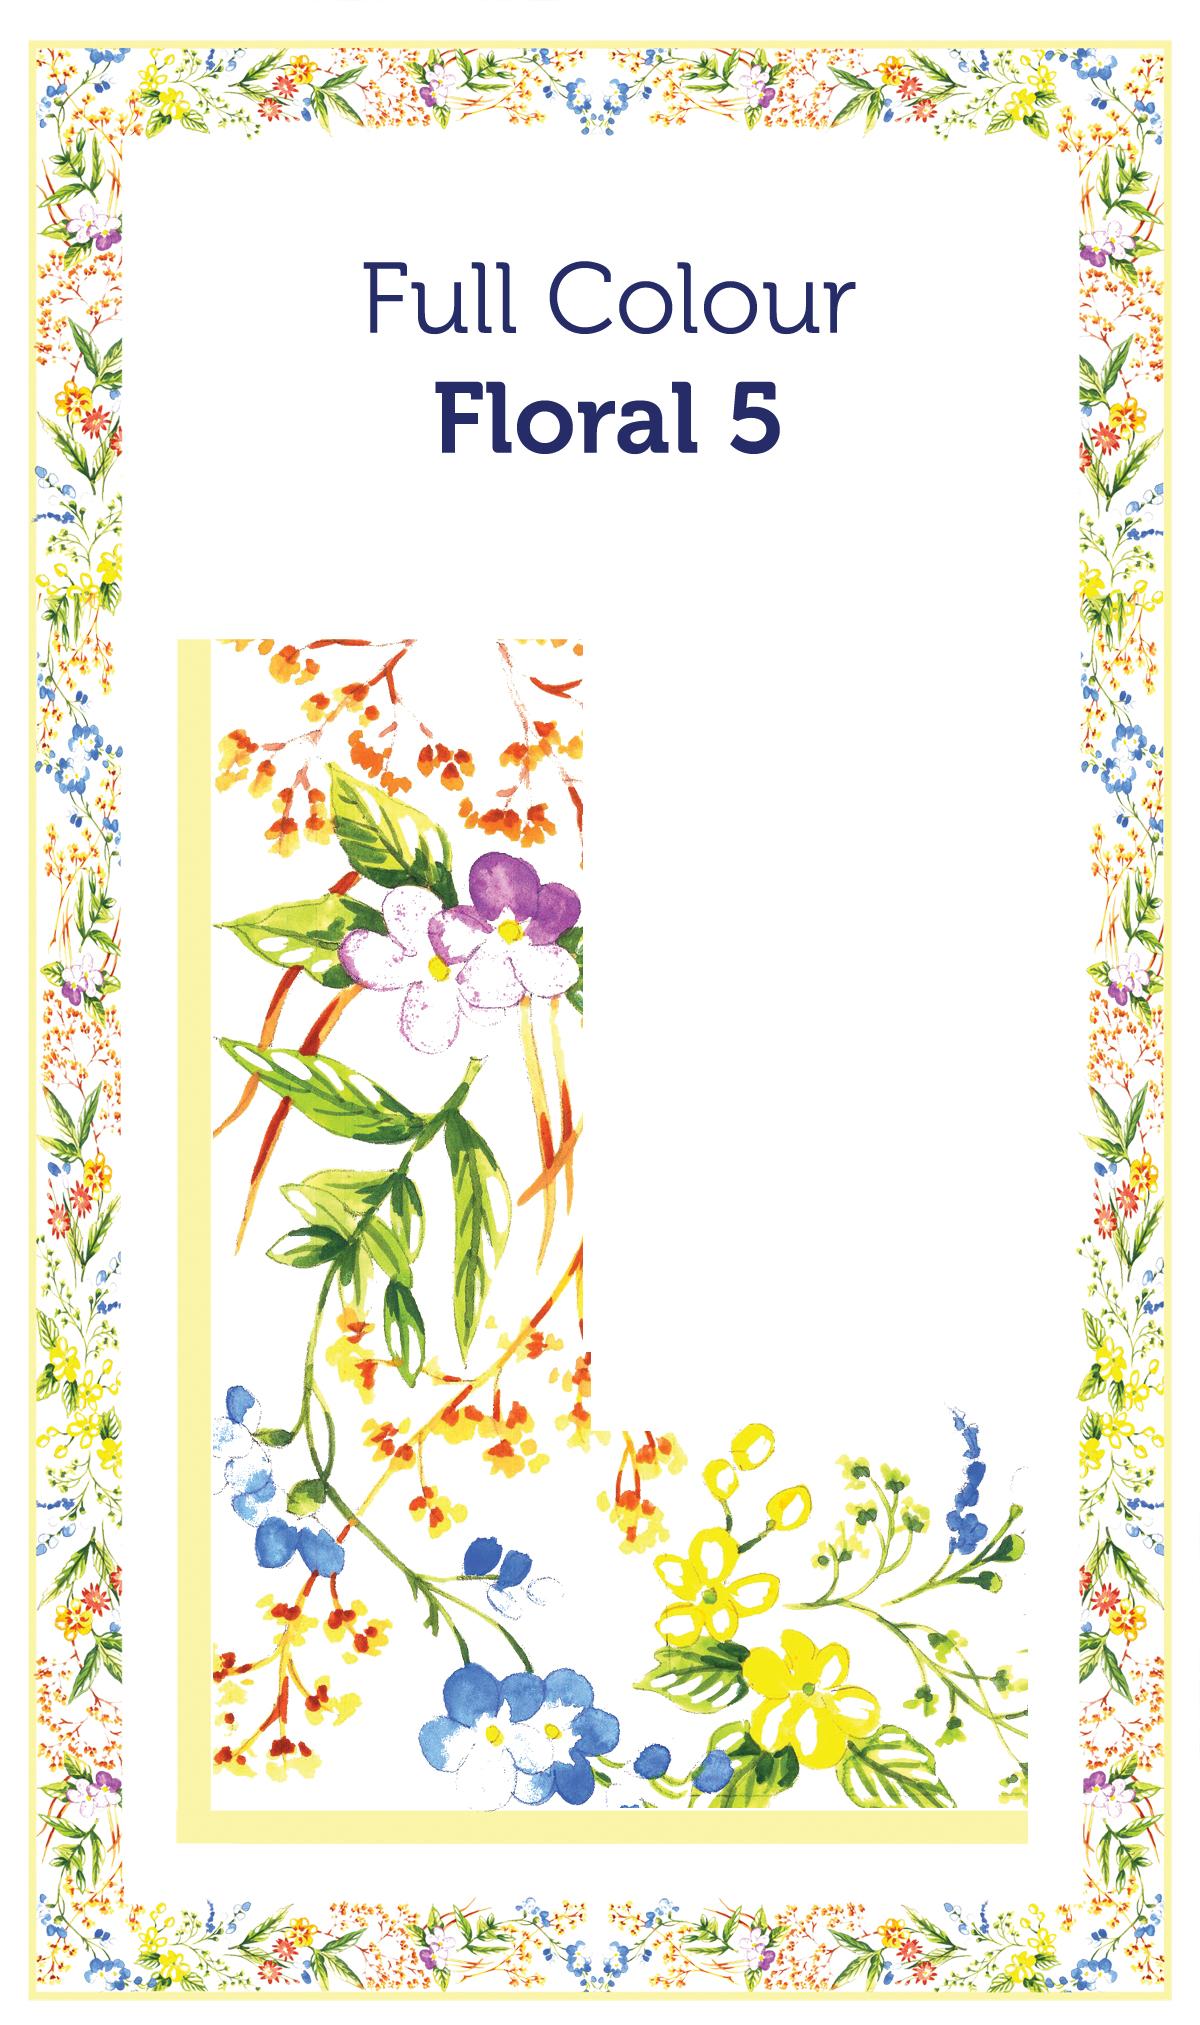 12_Floral_5_FullColour